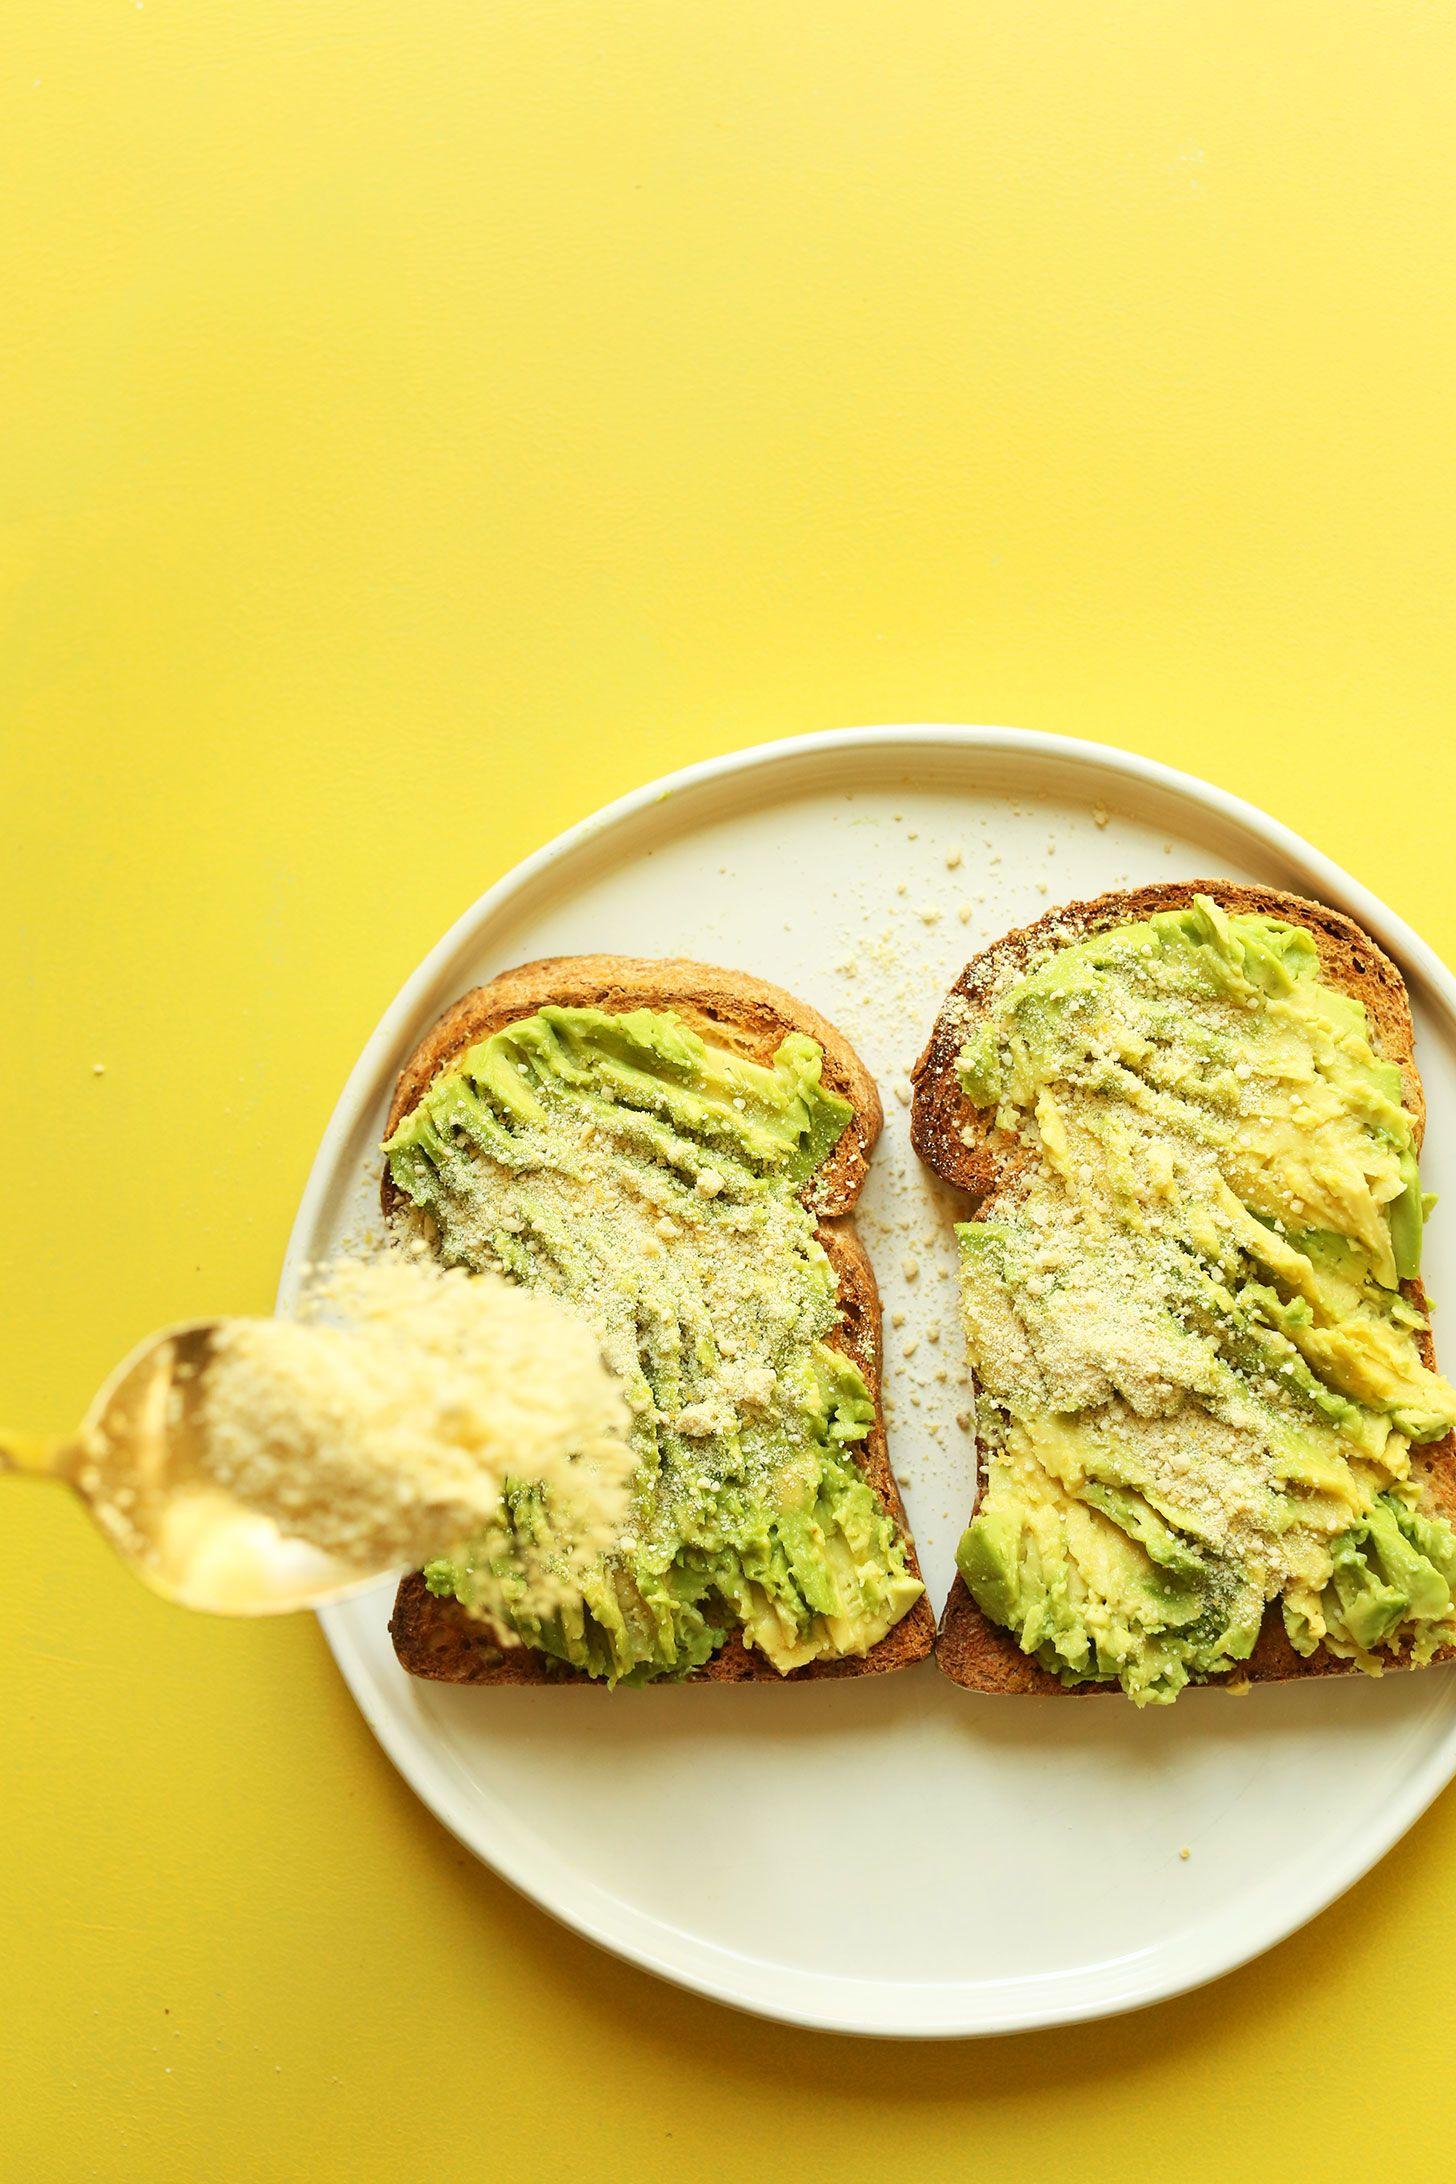 My GO-TO Avocado Toast! 5 minutes, 3 ingredients, SO delicious! #vegan #glutenfree #avocado #recipe #easy